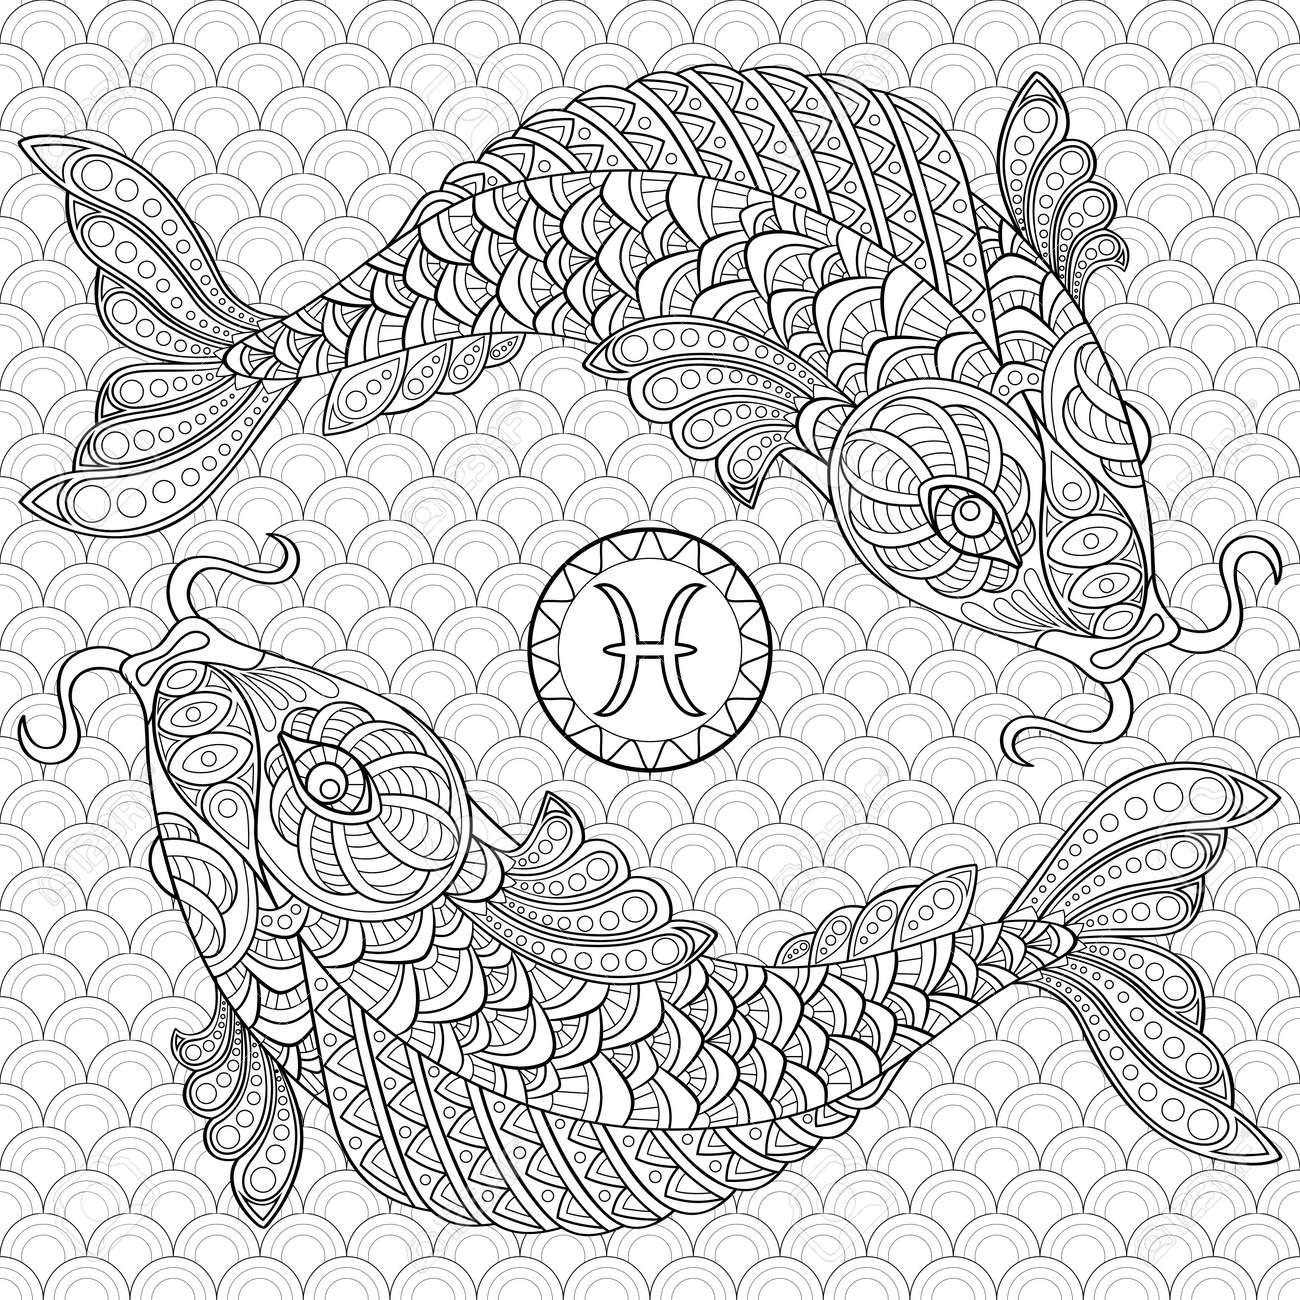 Koi Fish Coloring Page Top 25 Free Printable Koi Fish Coloring